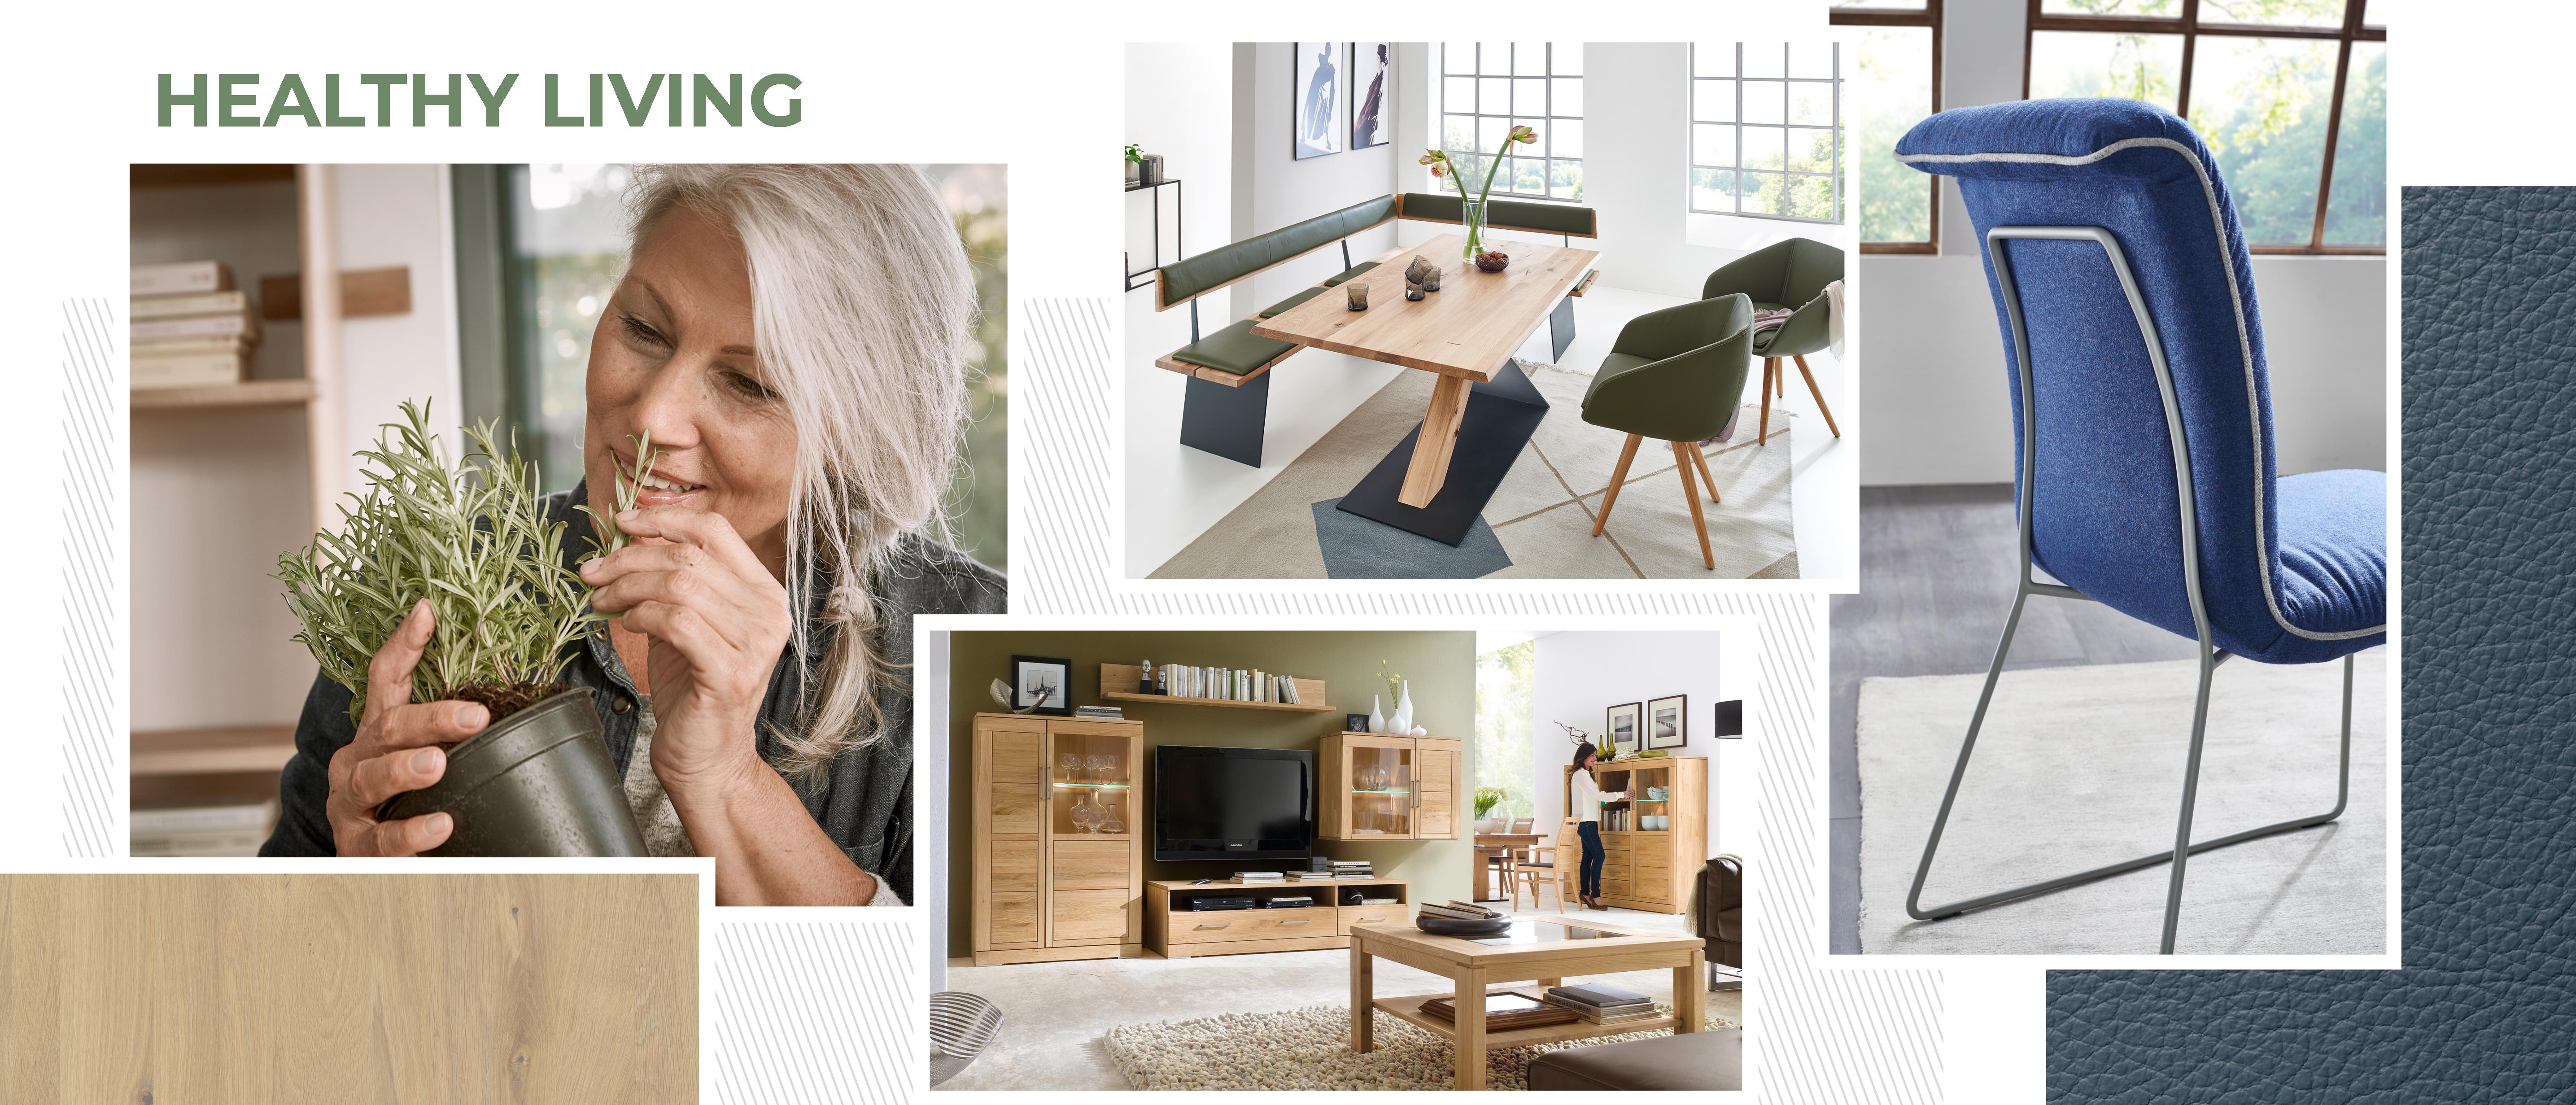 Wimmer Wohnkollektionen: Einrichtungstrends 2019 - Healthy living